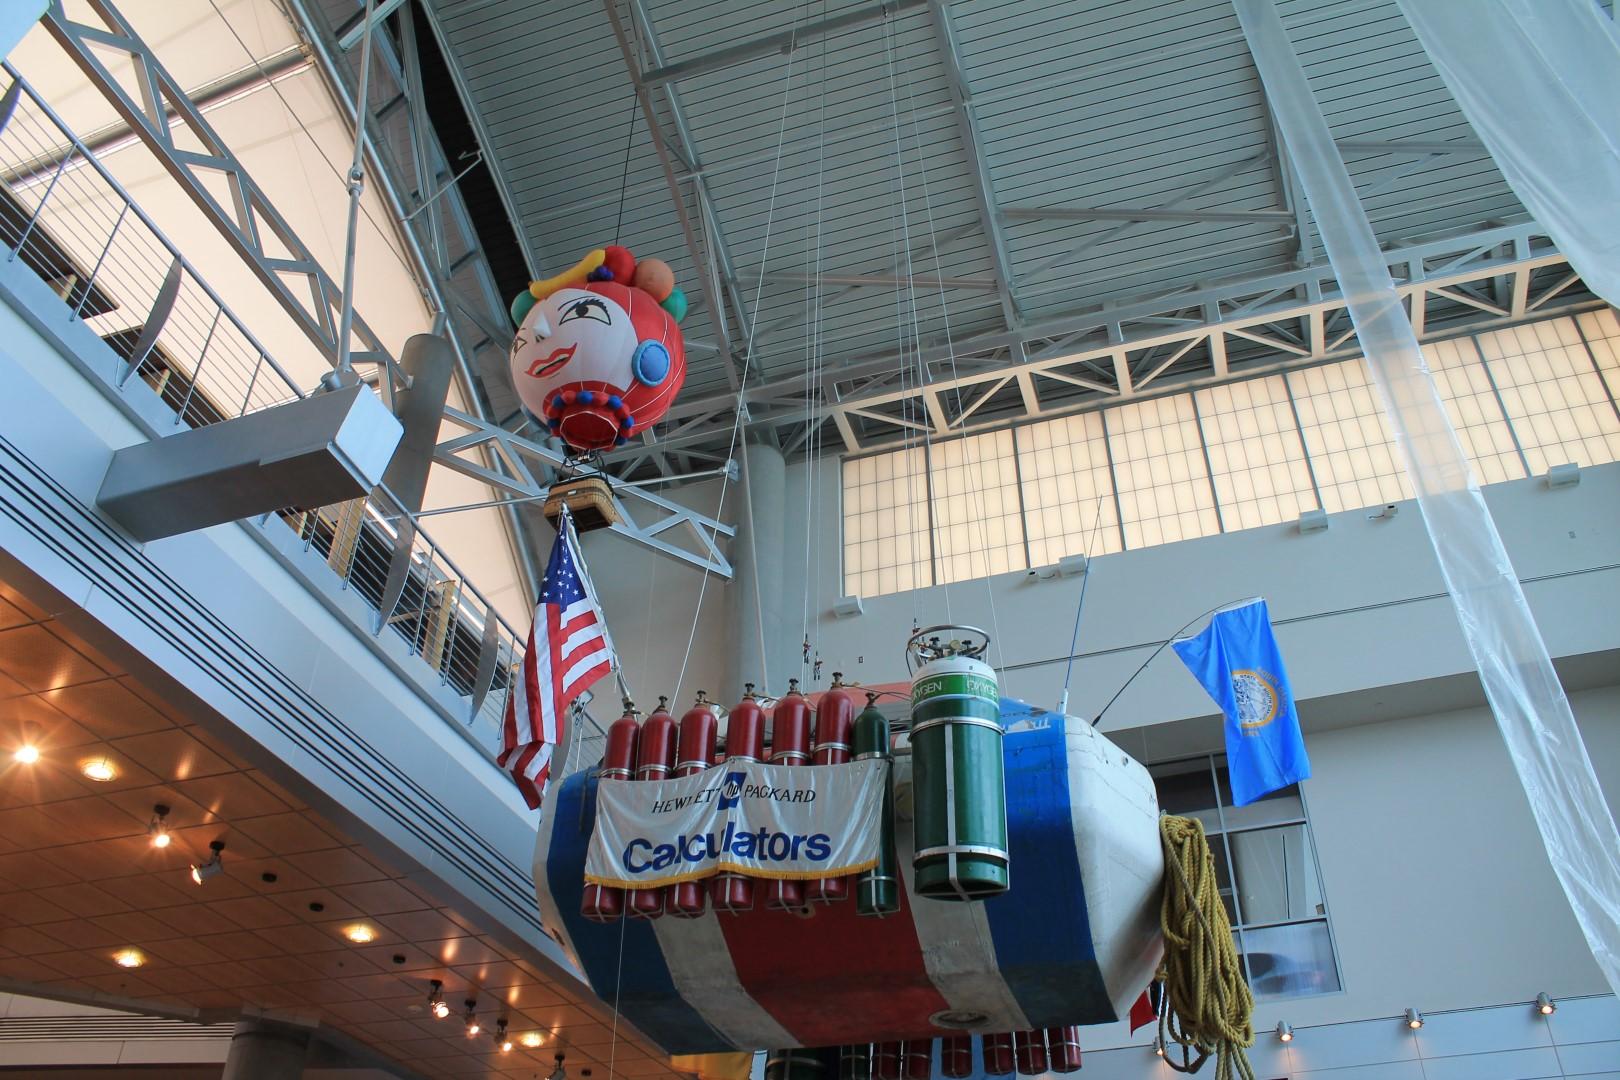 Baloon-Museum9.JPG